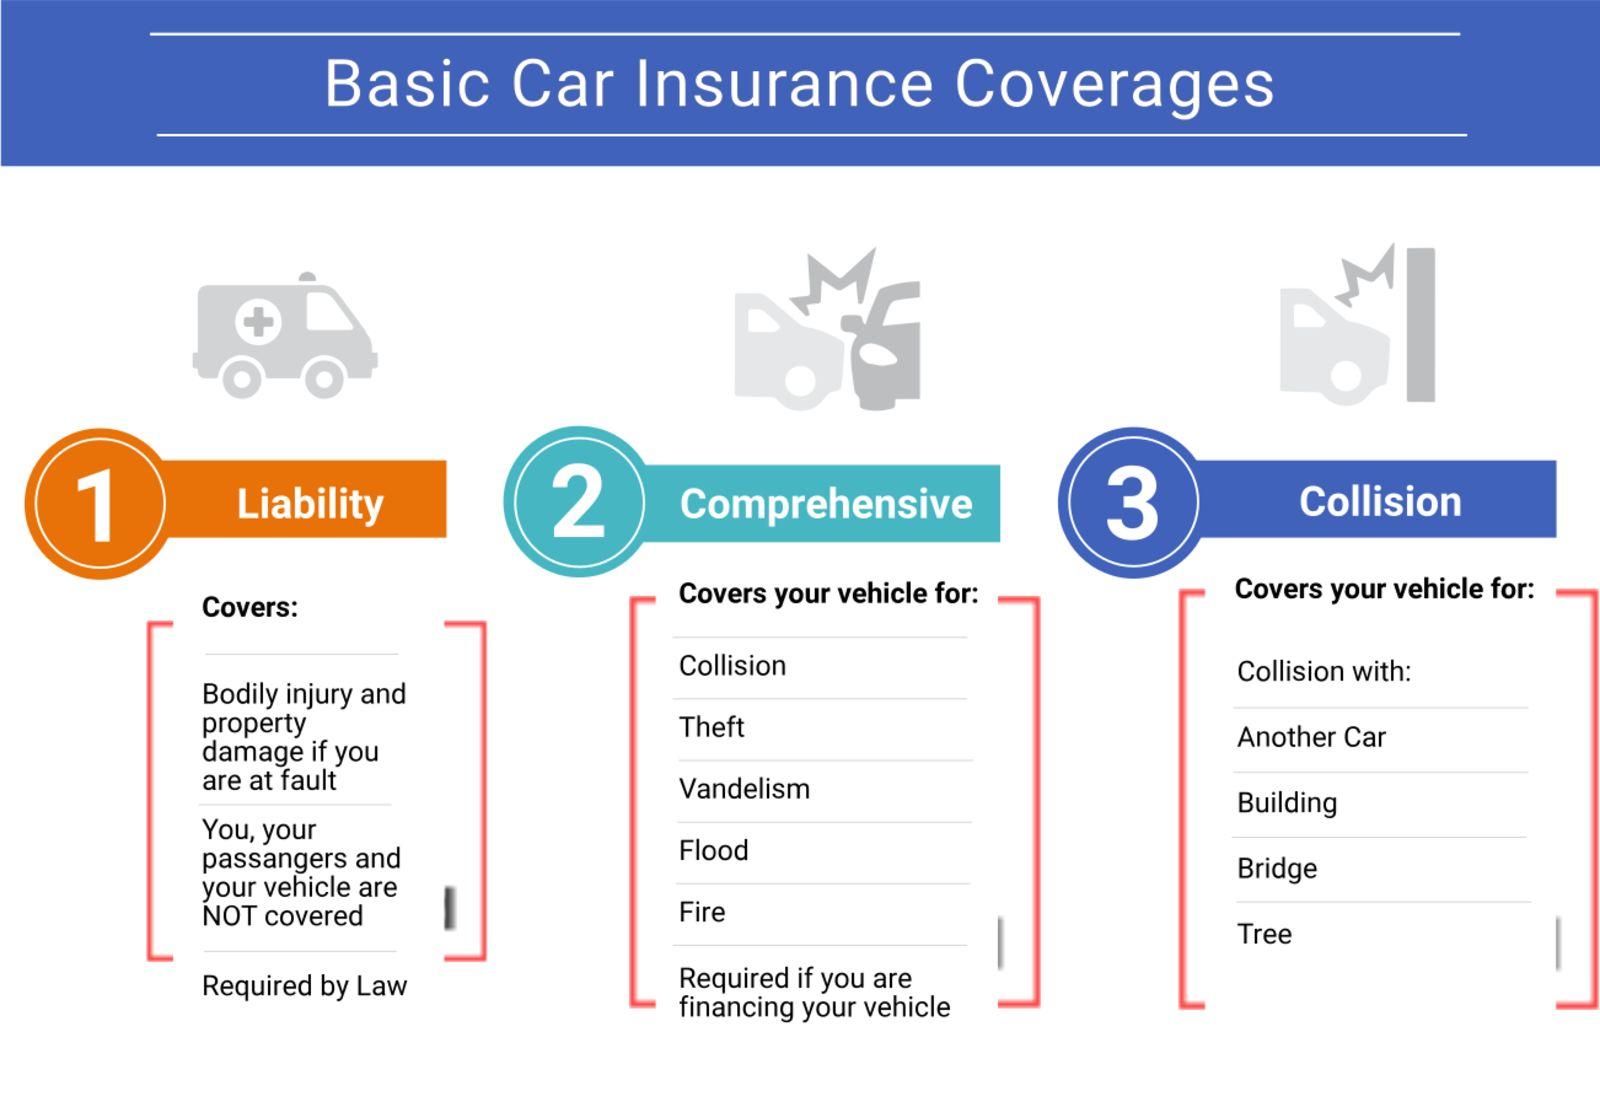 Basic car insurance coverages